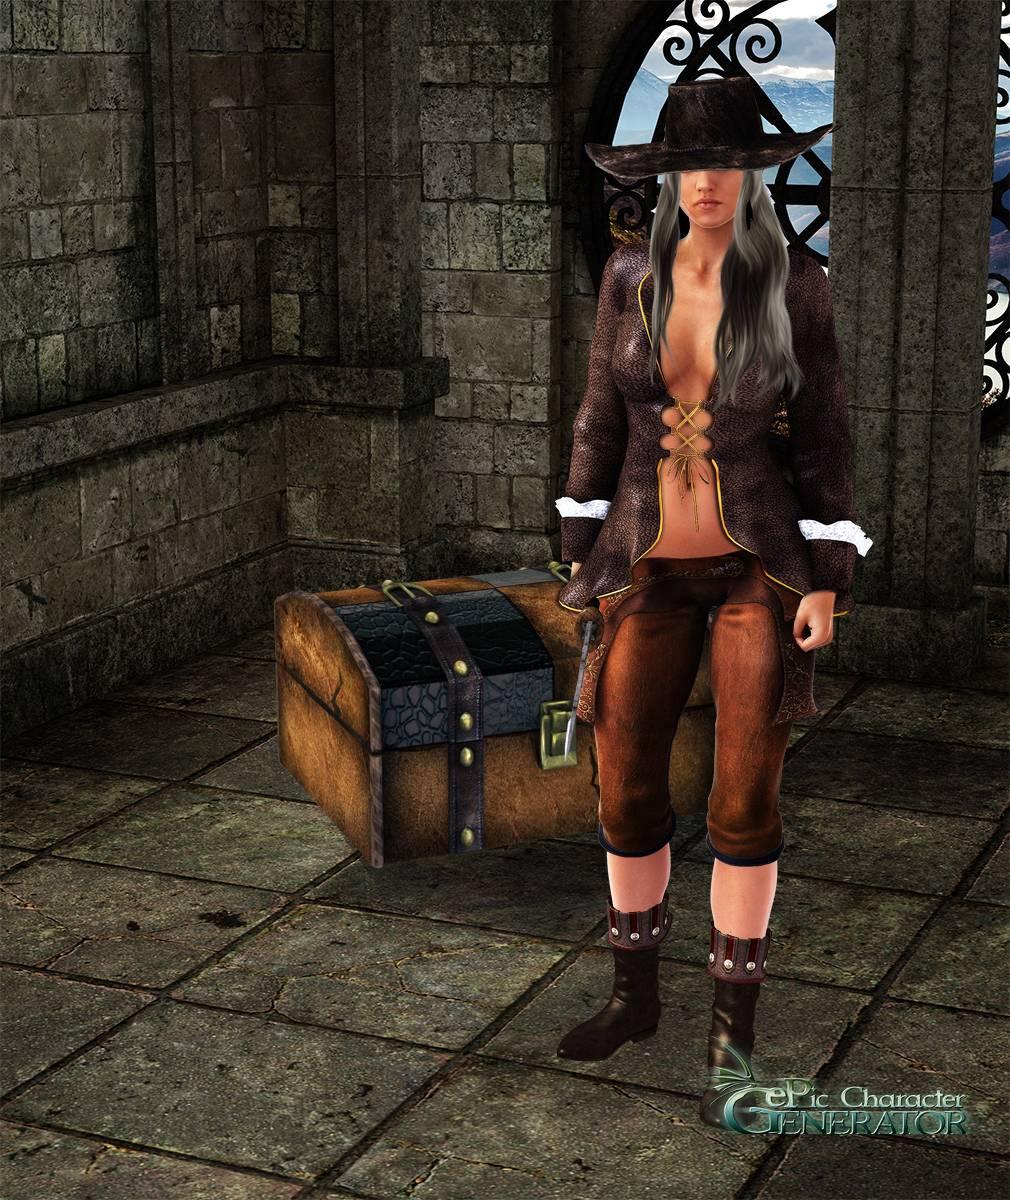 ePic Character Generator Season 2 Female Pirate Screenshot 03